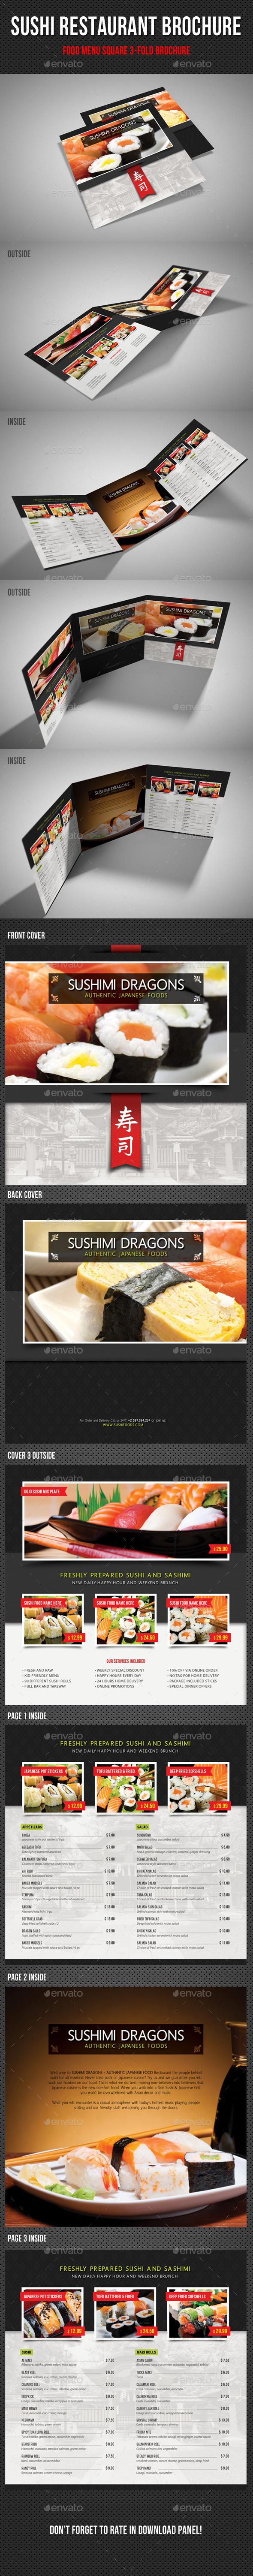 Sushi Restaurant Menu Square 3-Fold Brochure 04 - Food Menus Print Templates